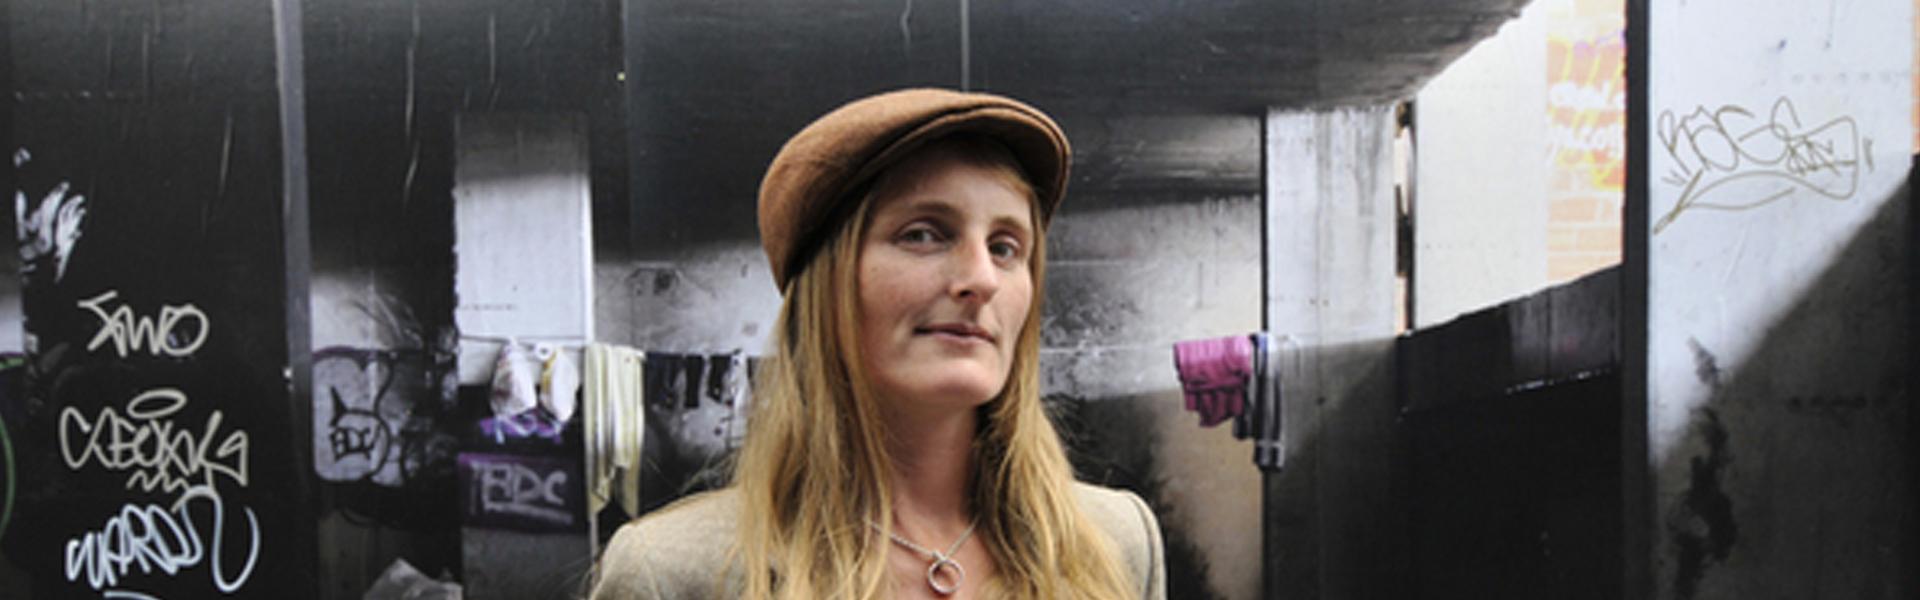 Bristol Explorers Lisa Furness